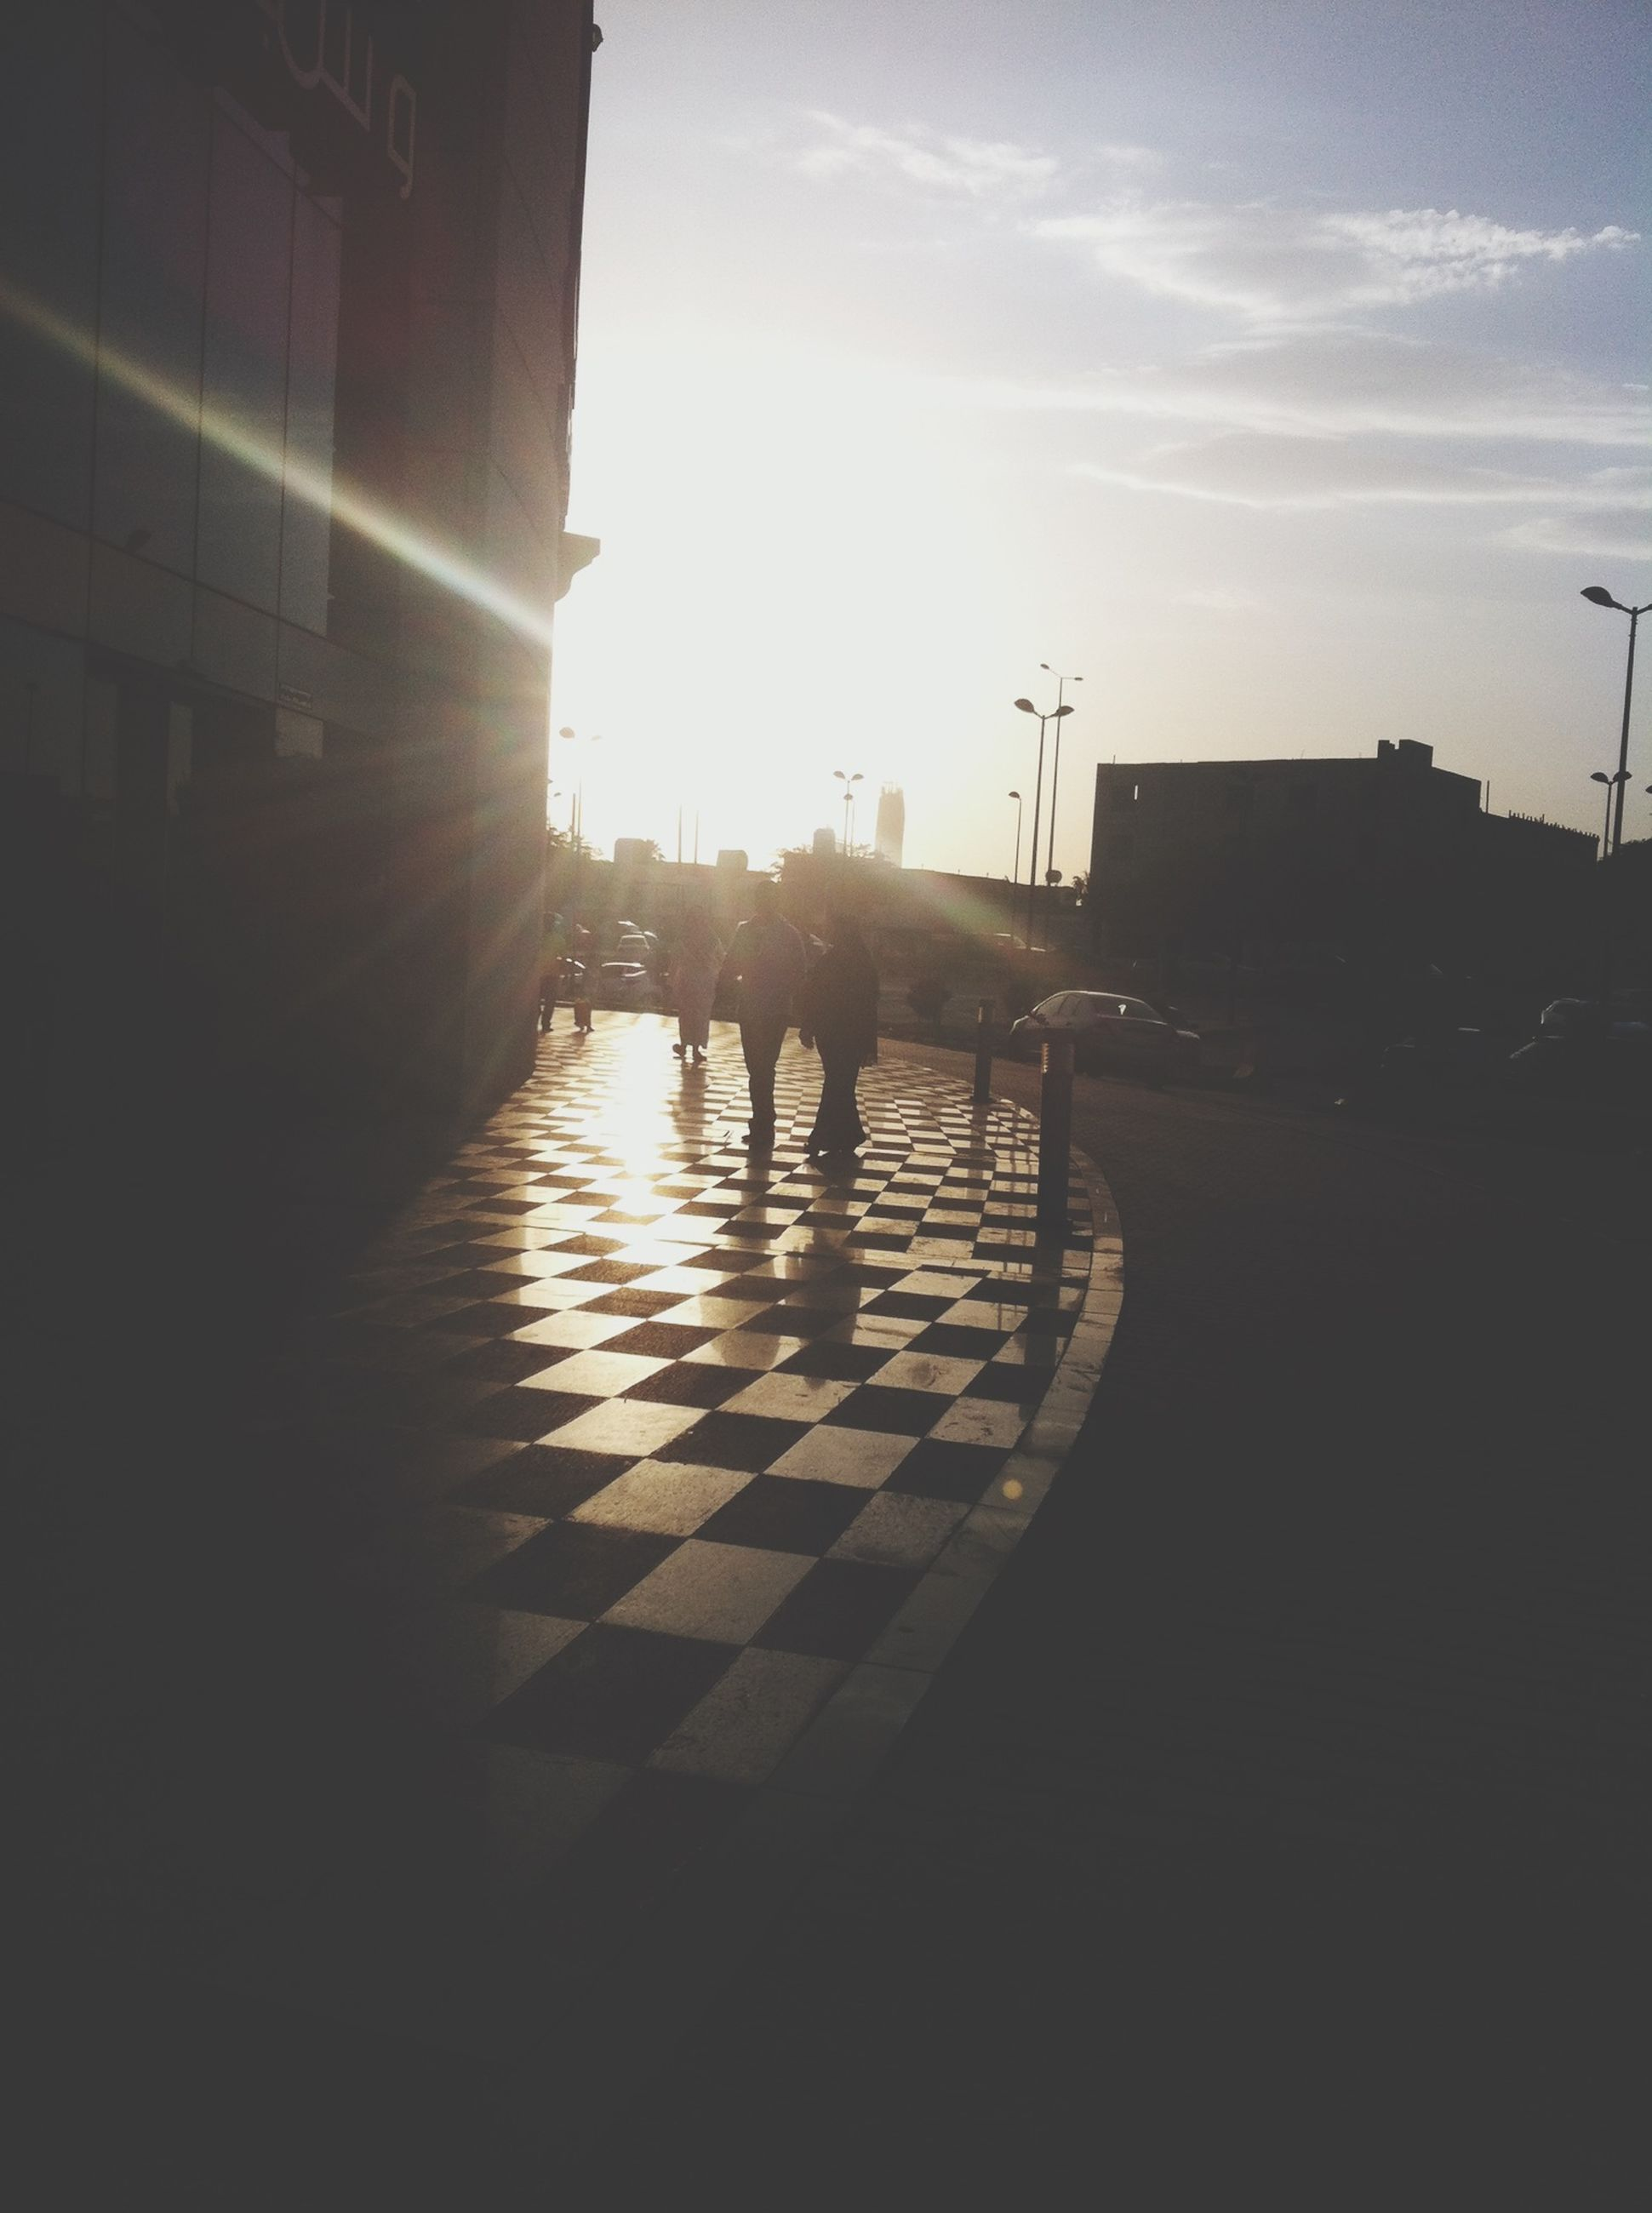 sun, sunlight, sunbeam, built structure, architecture, building exterior, lens flare, sunset, sky, lifestyles, silhouette, men, leisure activity, walking, street, sunny, city, outdoors